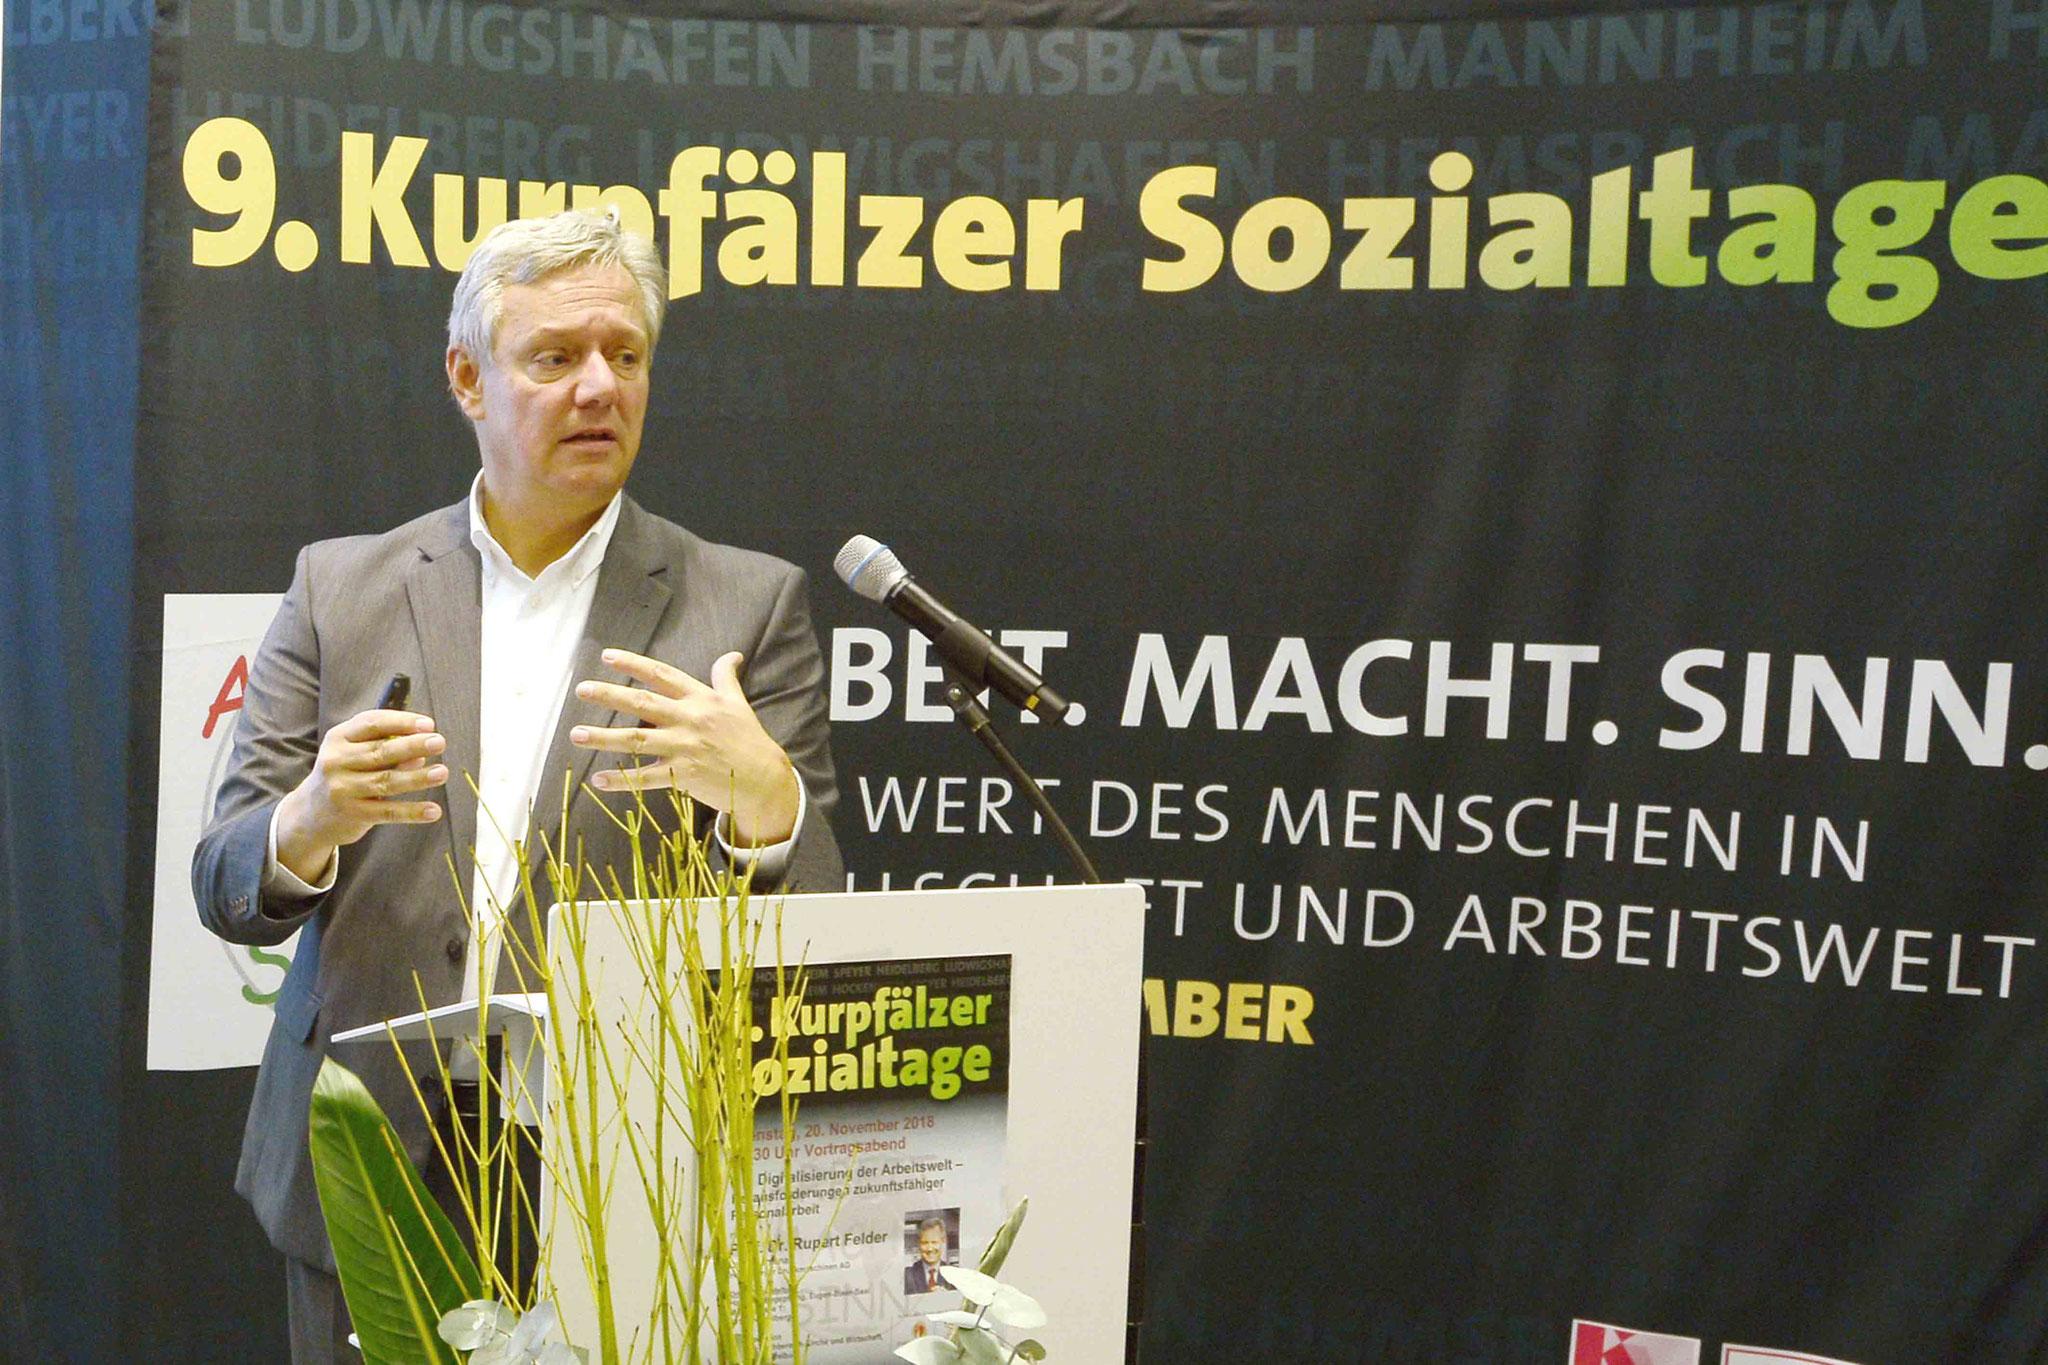 Prof. Dr. Felder, Bild: Copyright by Helmut G. Roos